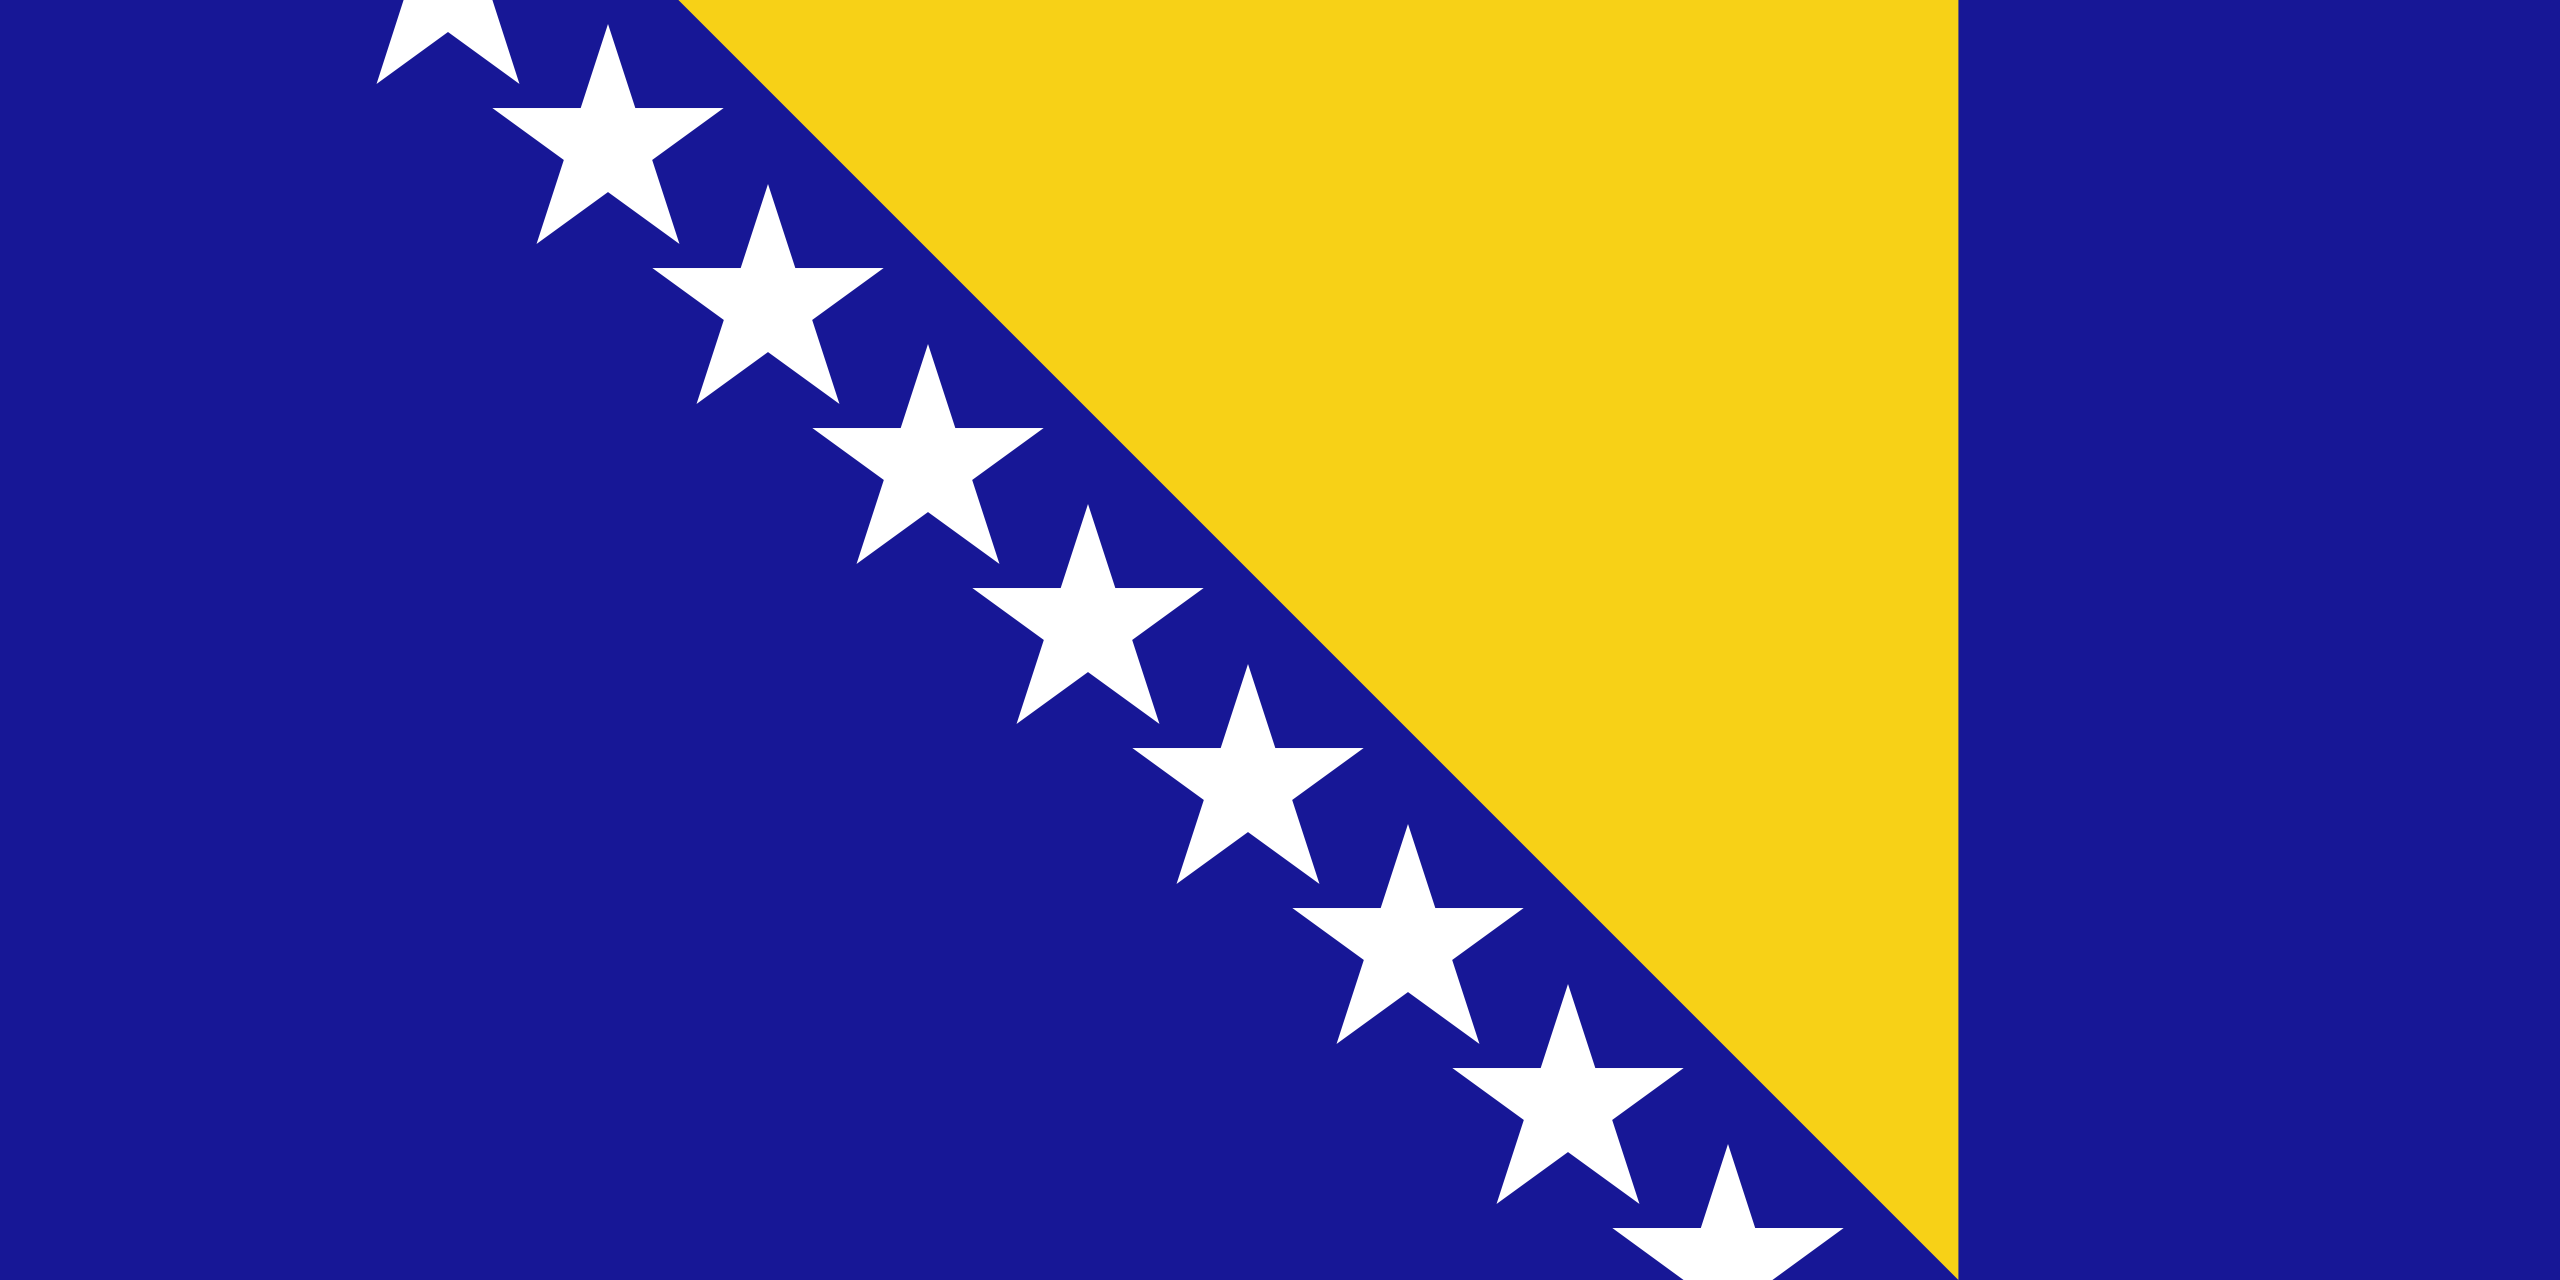 bosnia y herzegovina, Land, Emblem, Logo, Symbol - Wallpaper HD - Prof.-falken.com